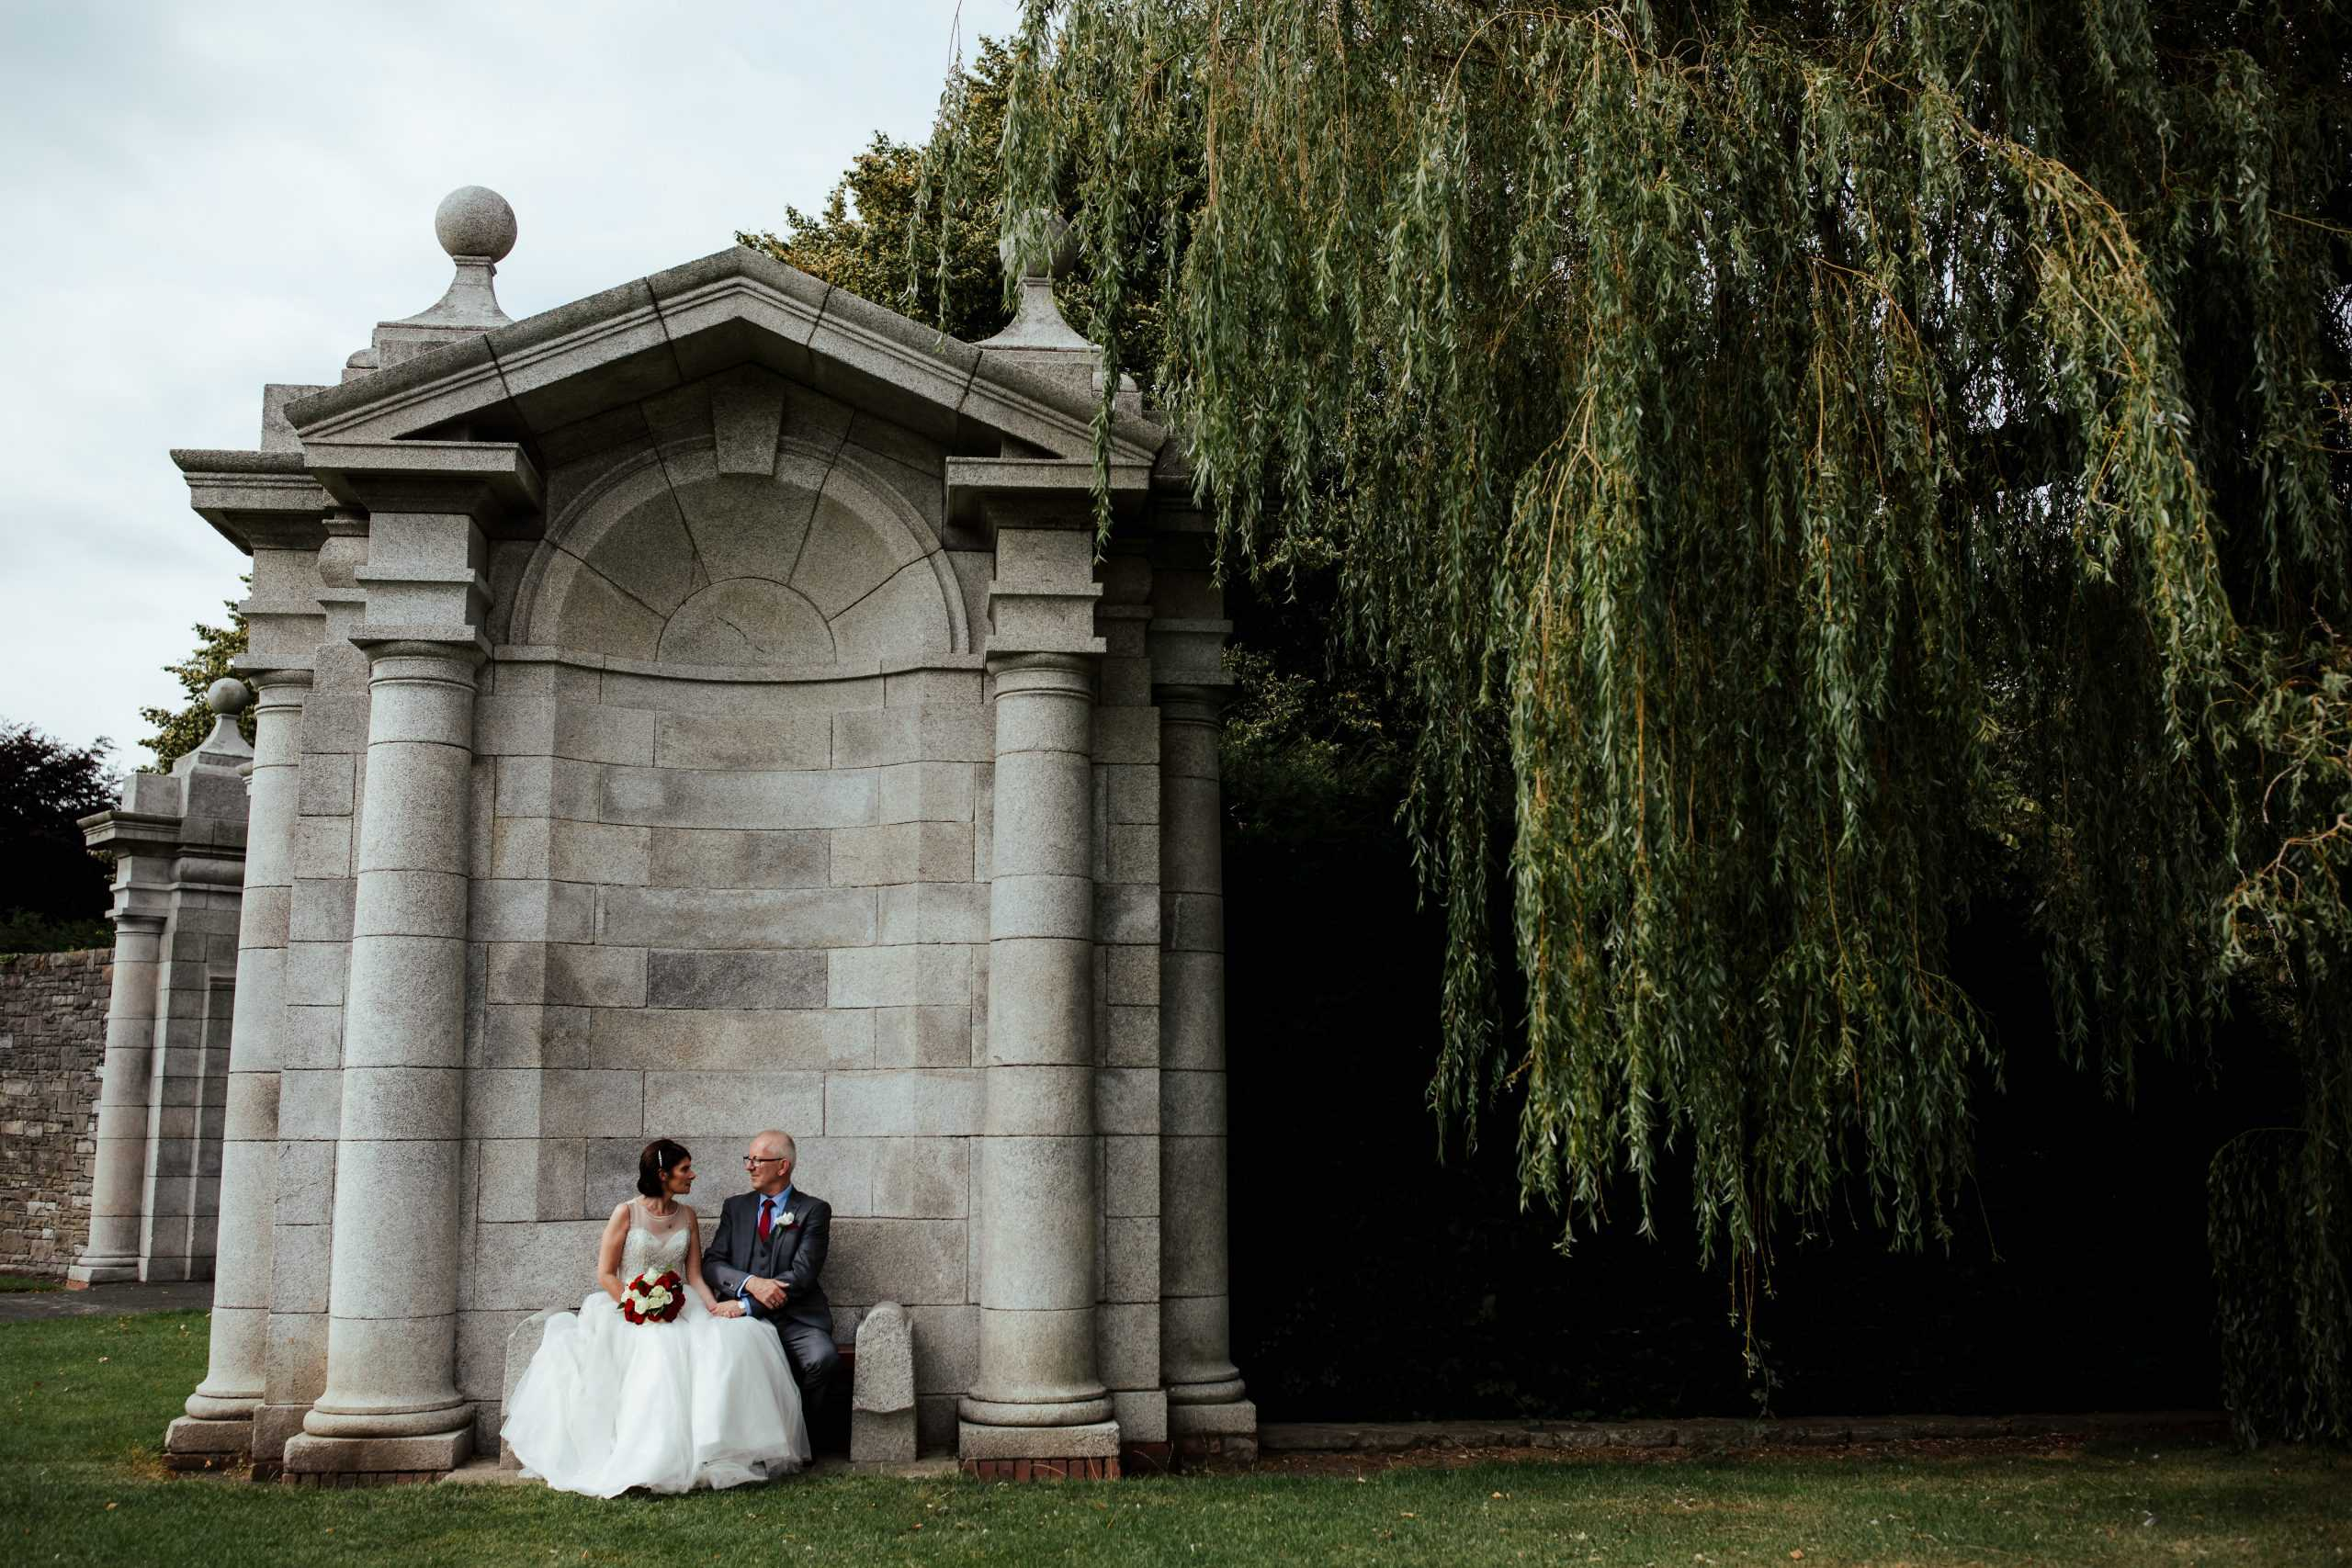 wedding photo in irish war memorial gardens dublin